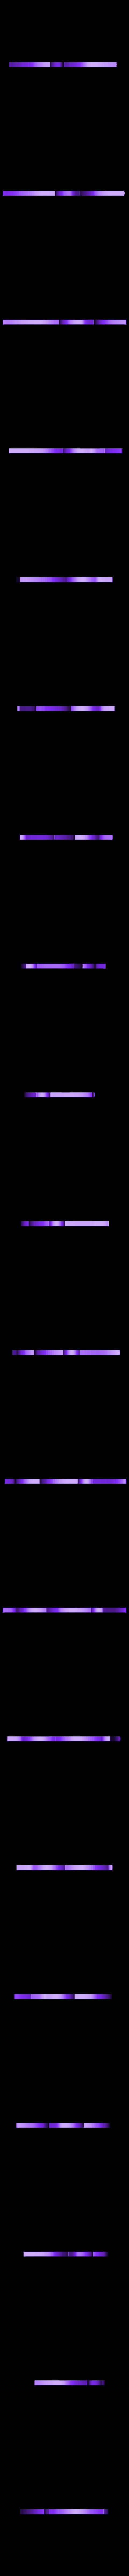 Bird_Silhouette_Grey.STL Download free STL file Multi-Color Owl Coat Hanger • Design to 3D print, MosaicManufacturing